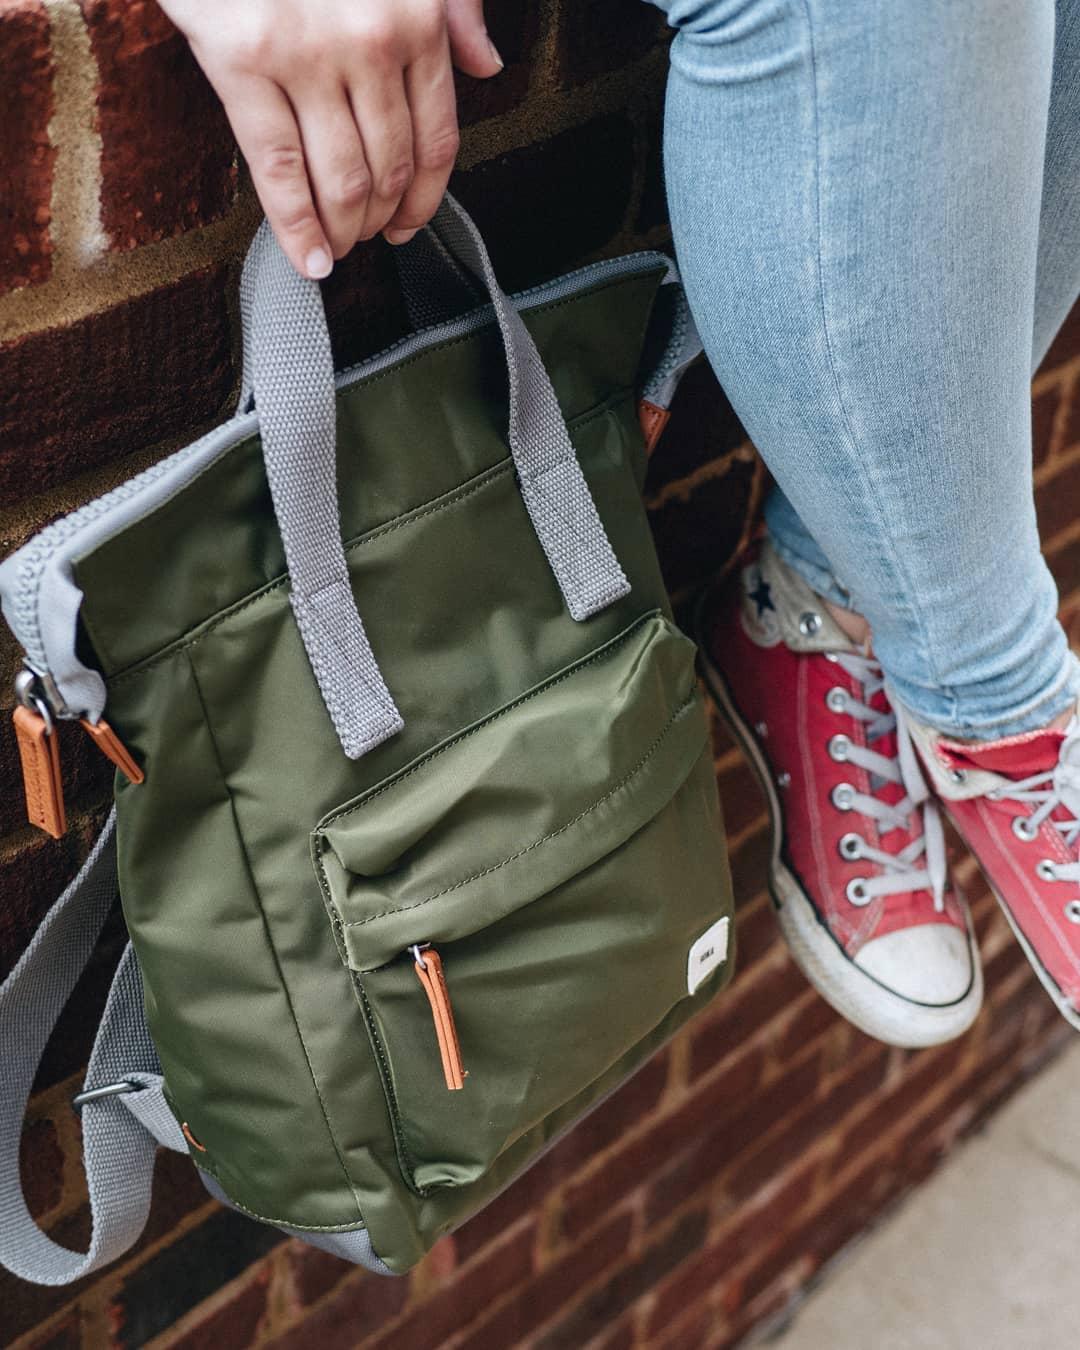 Sift & Pick - Roka United Kingdom Bag Brand